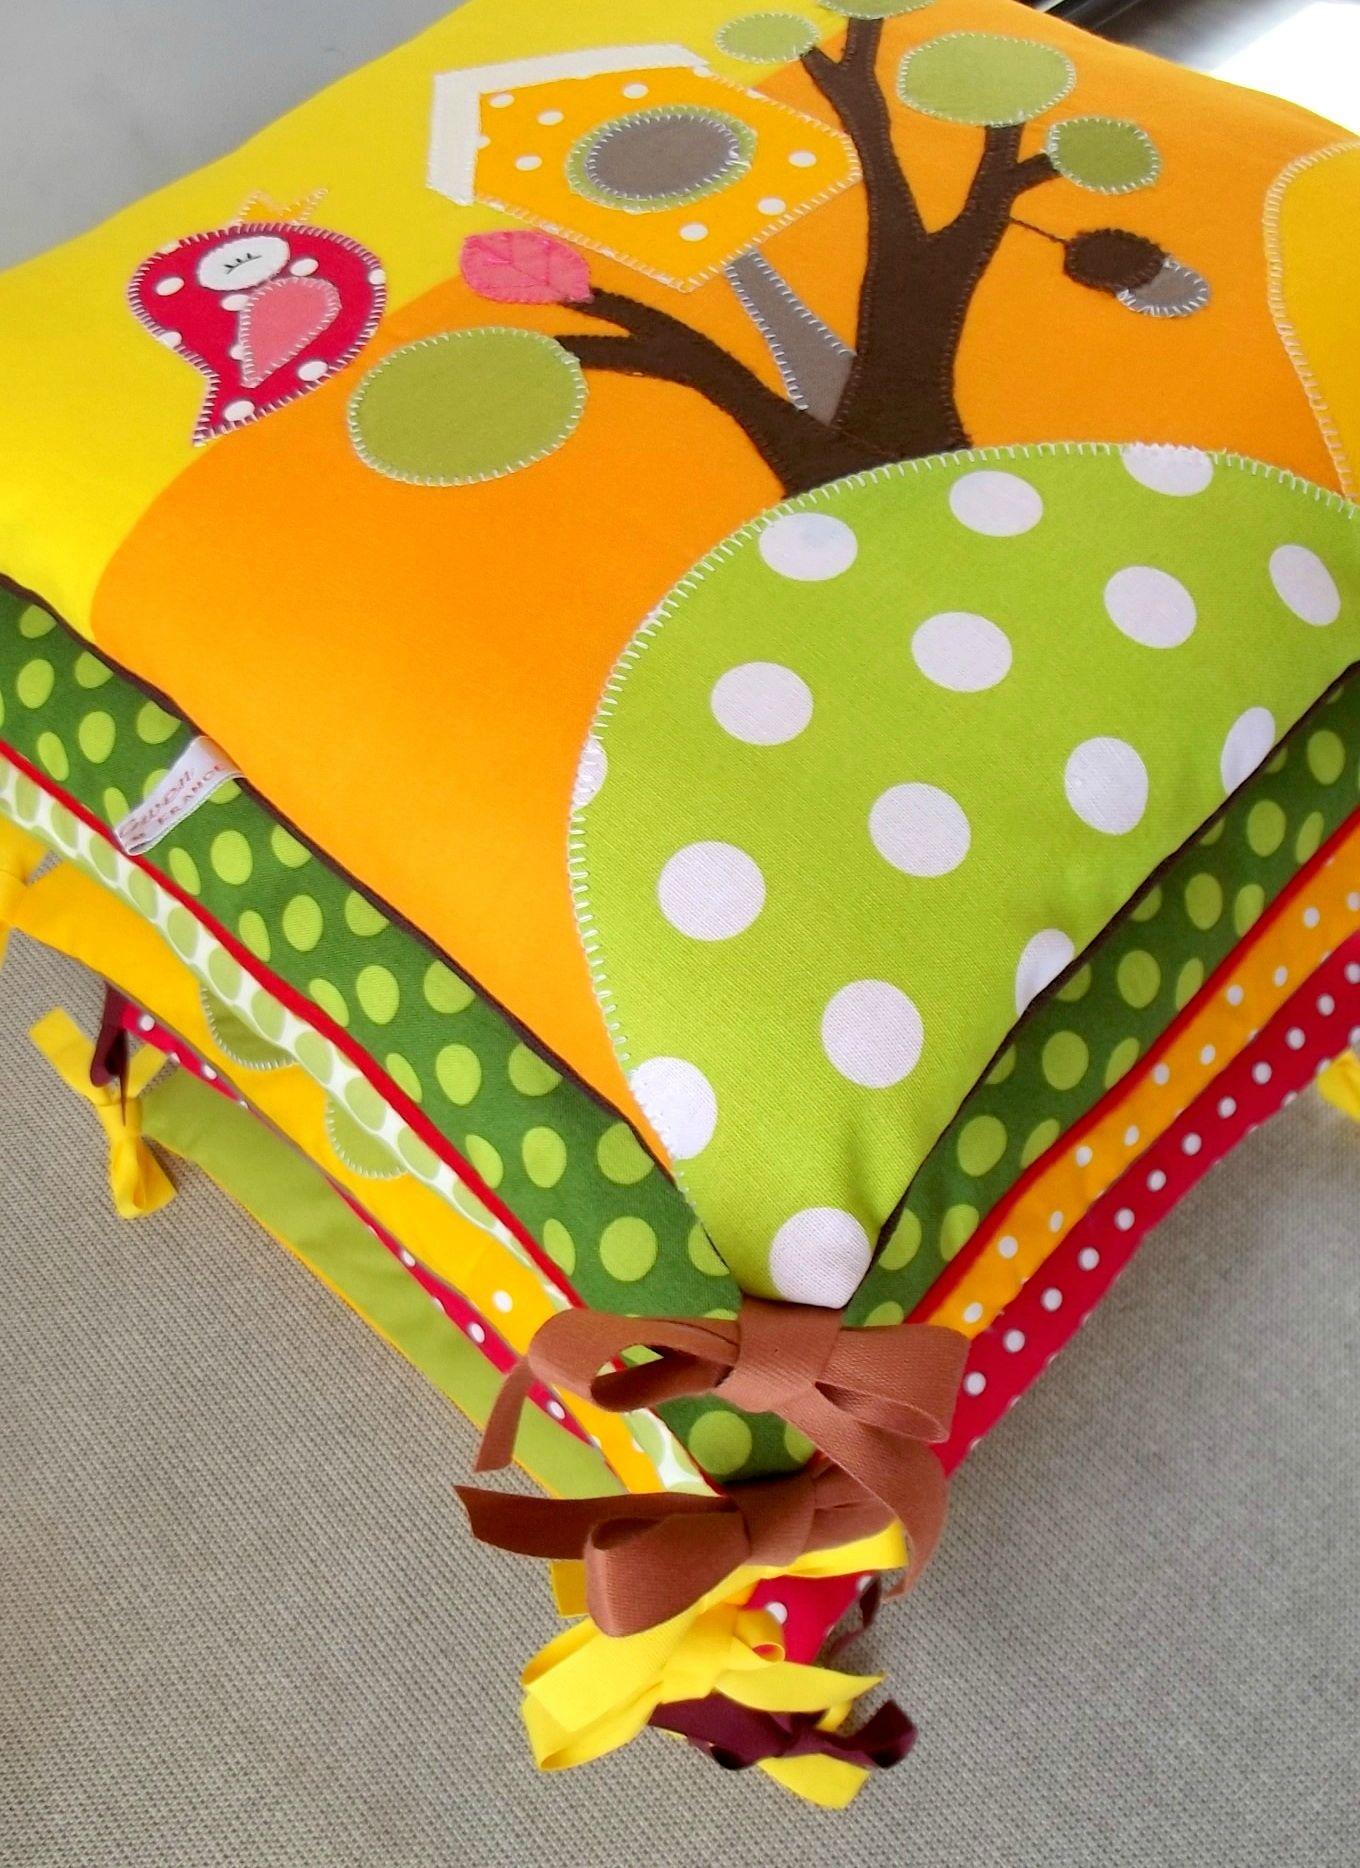 for t enchant e creagwen sewing pillows and tour de lit. Black Bedroom Furniture Sets. Home Design Ideas